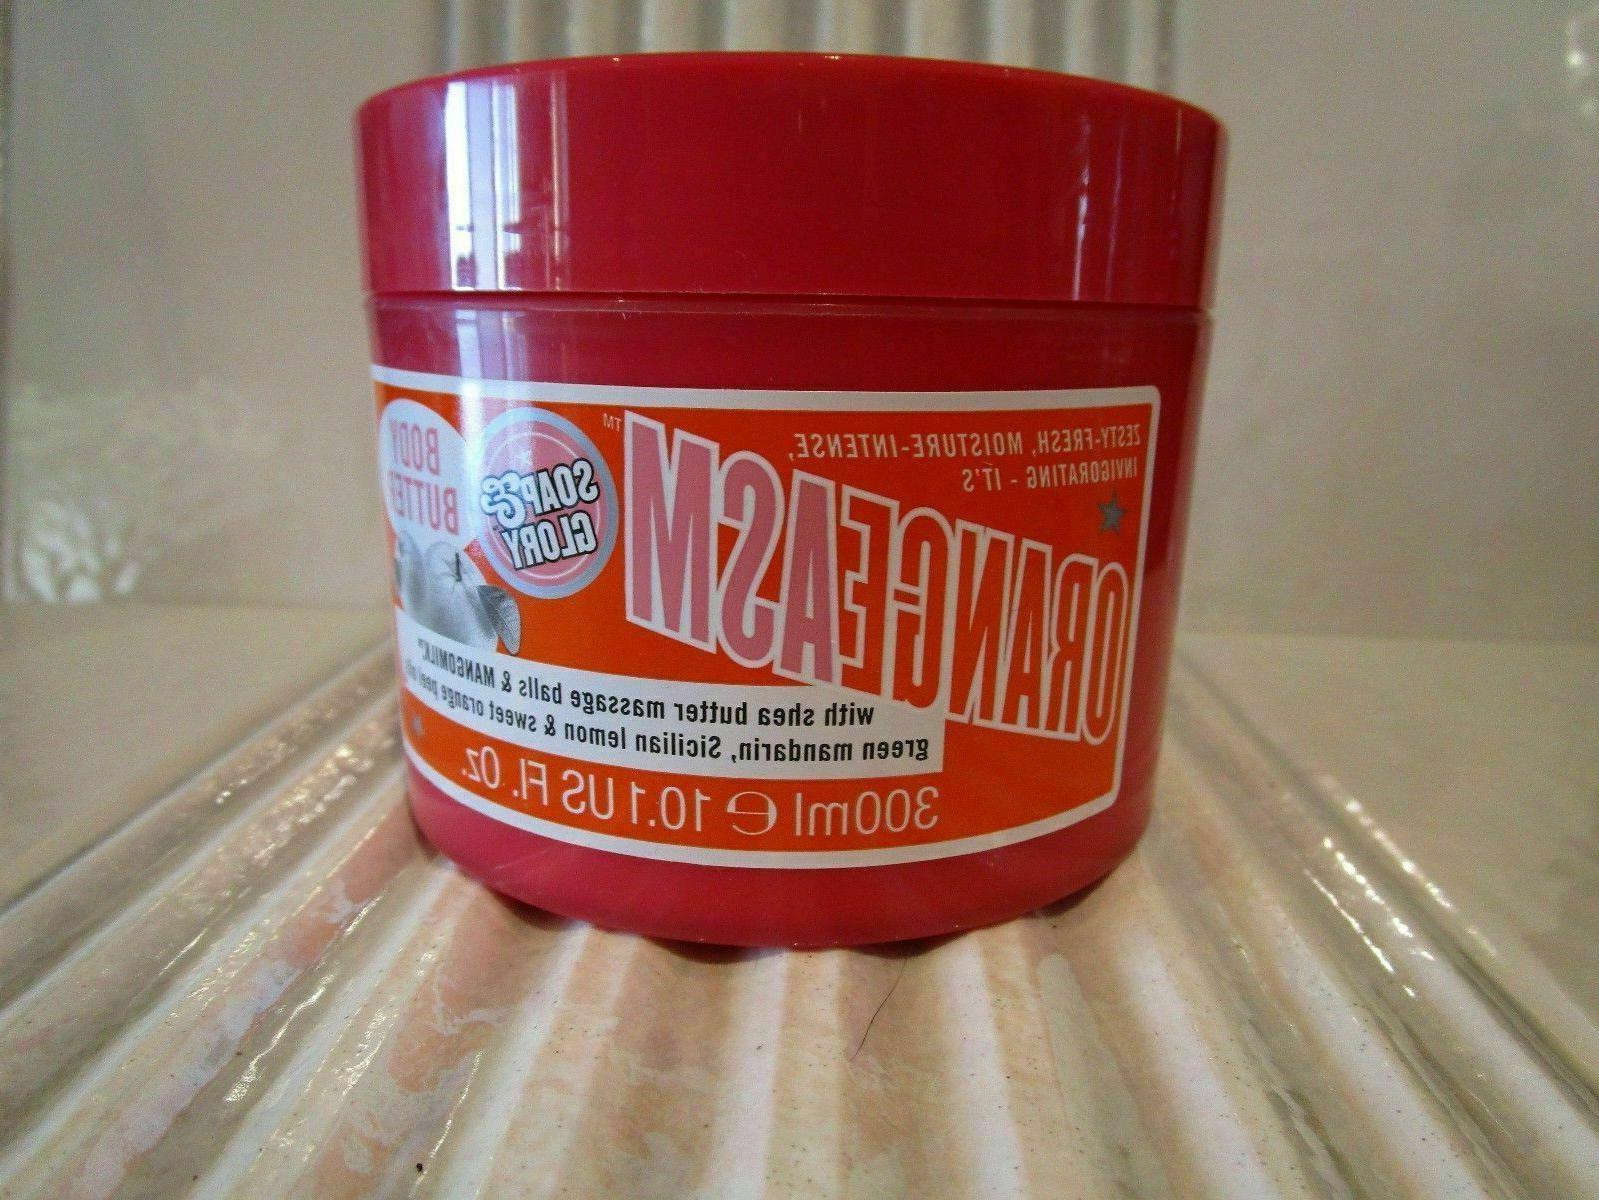 soap and glory orangeasm body butter 10